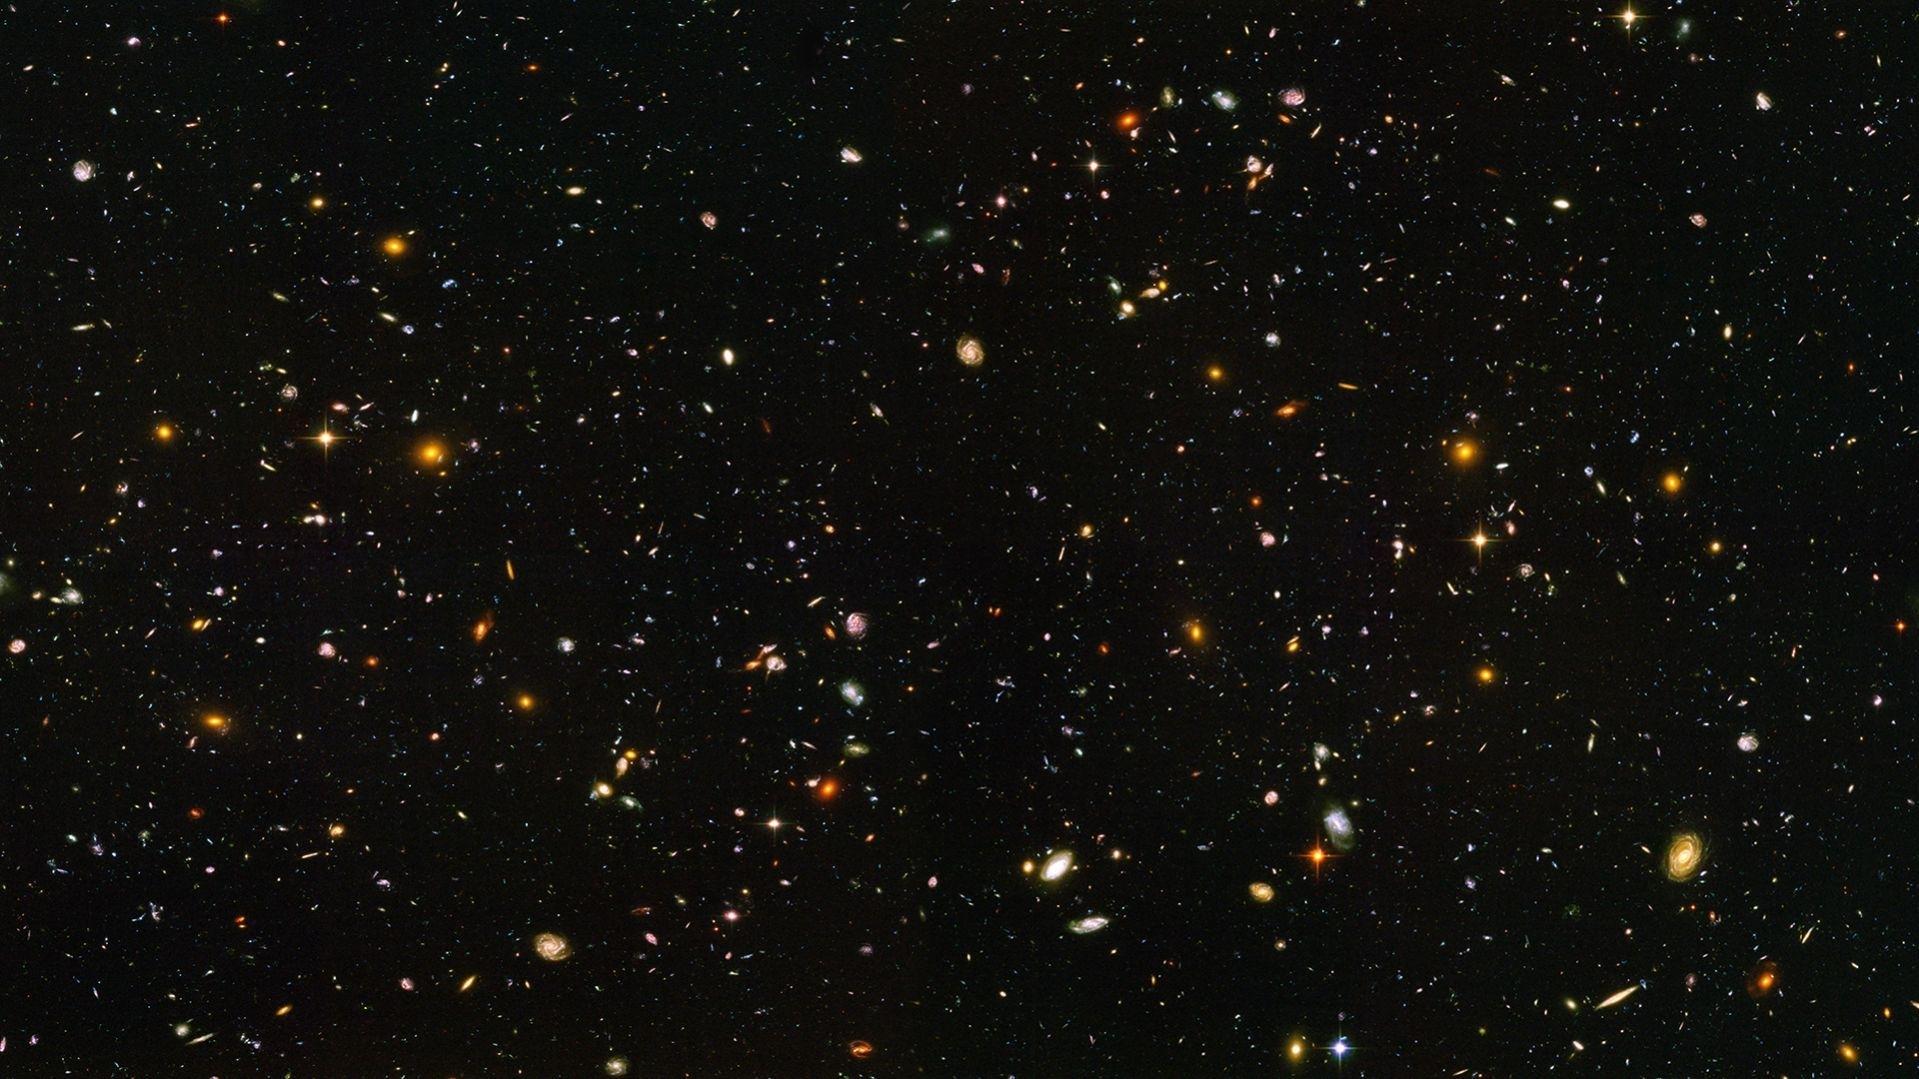 hubble ultra deep field wallpapers group (73+)